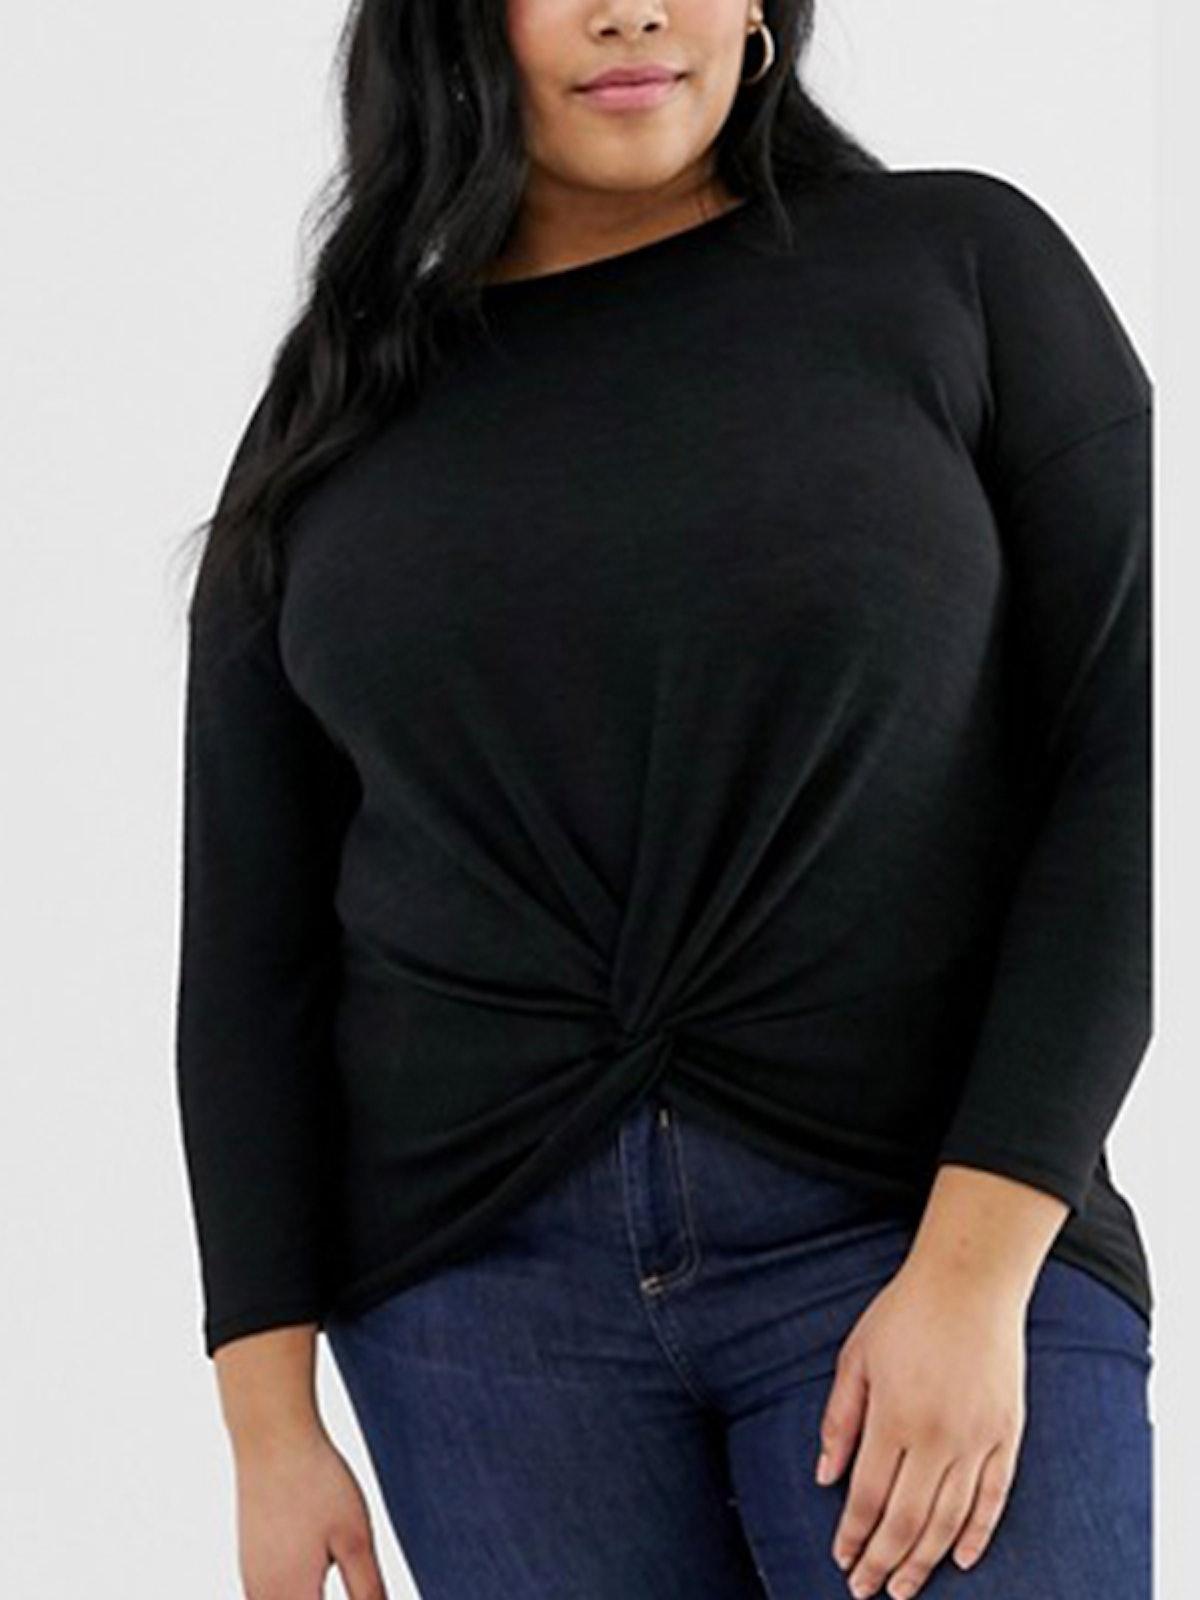 Long Sleeve Twist Front Tee In Black